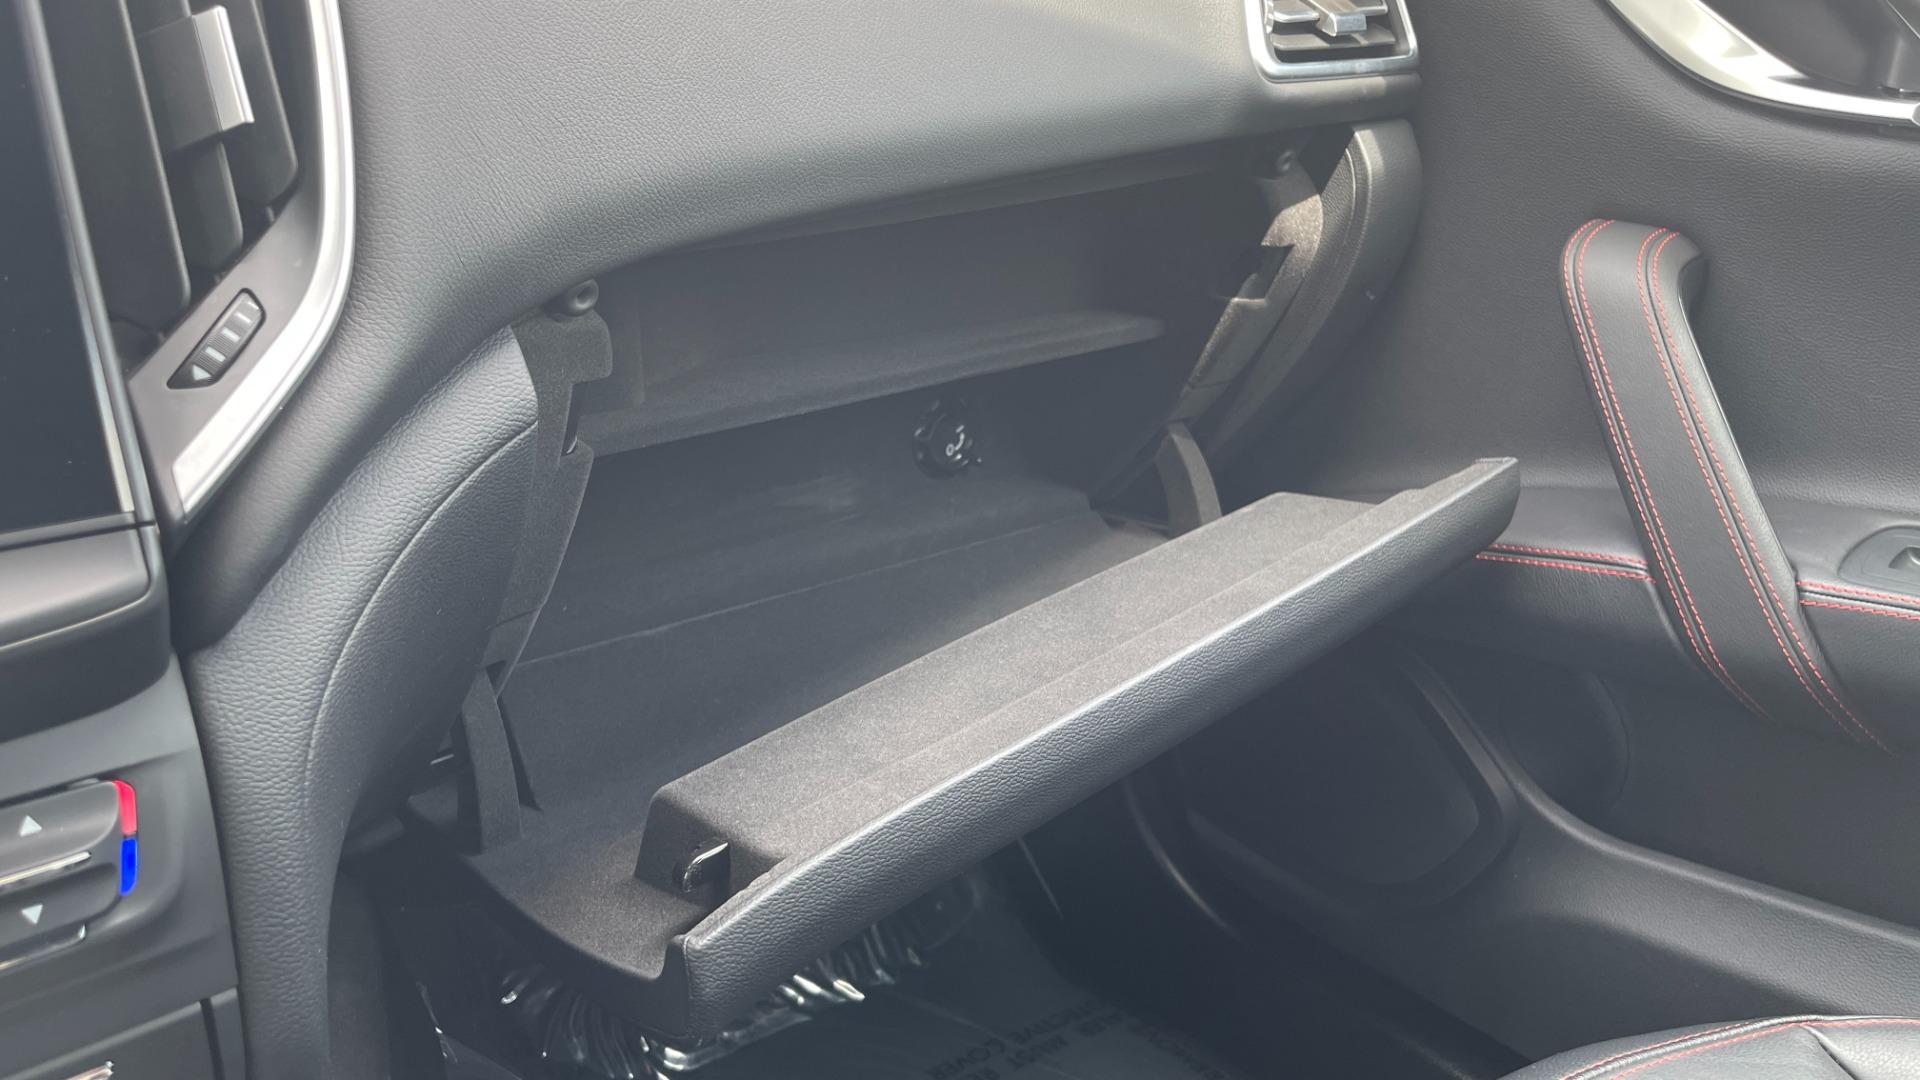 Used 2018 Maserati GHIBLI S Q4 SEDAN / AWD / 3.0L V6 / SUNROOF / NAV / REARVIEW for sale $51,995 at Formula Imports in Charlotte NC 28227 45